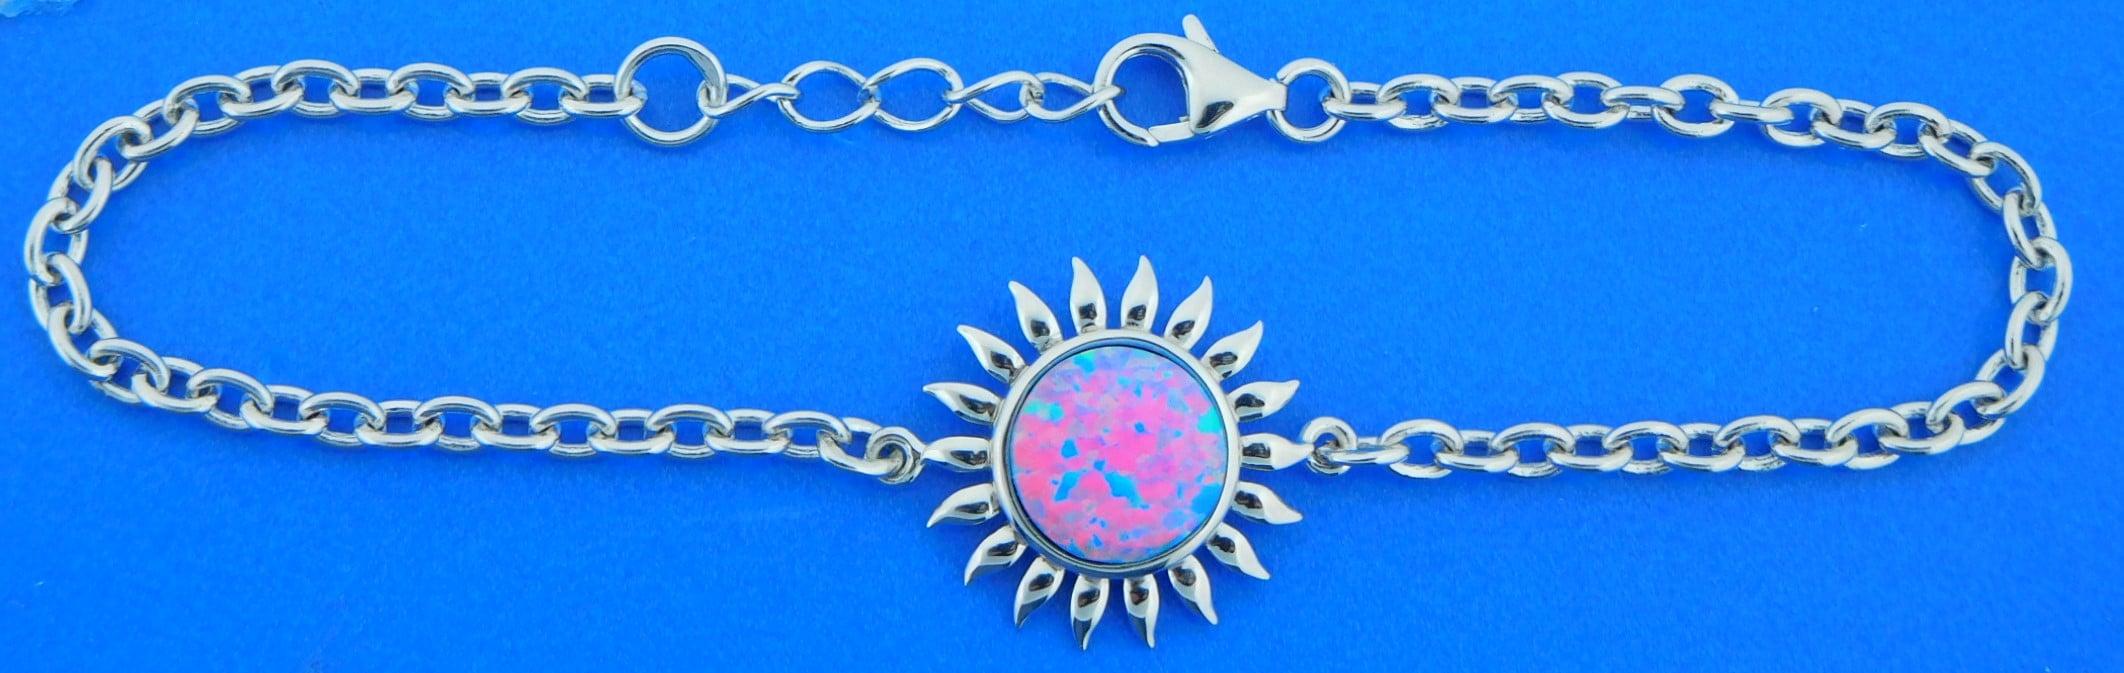 1636a0e3eb8a3 Alamea Sunflower Opal Bracelet, Sterling Silver | Island Sun Jewelry ...